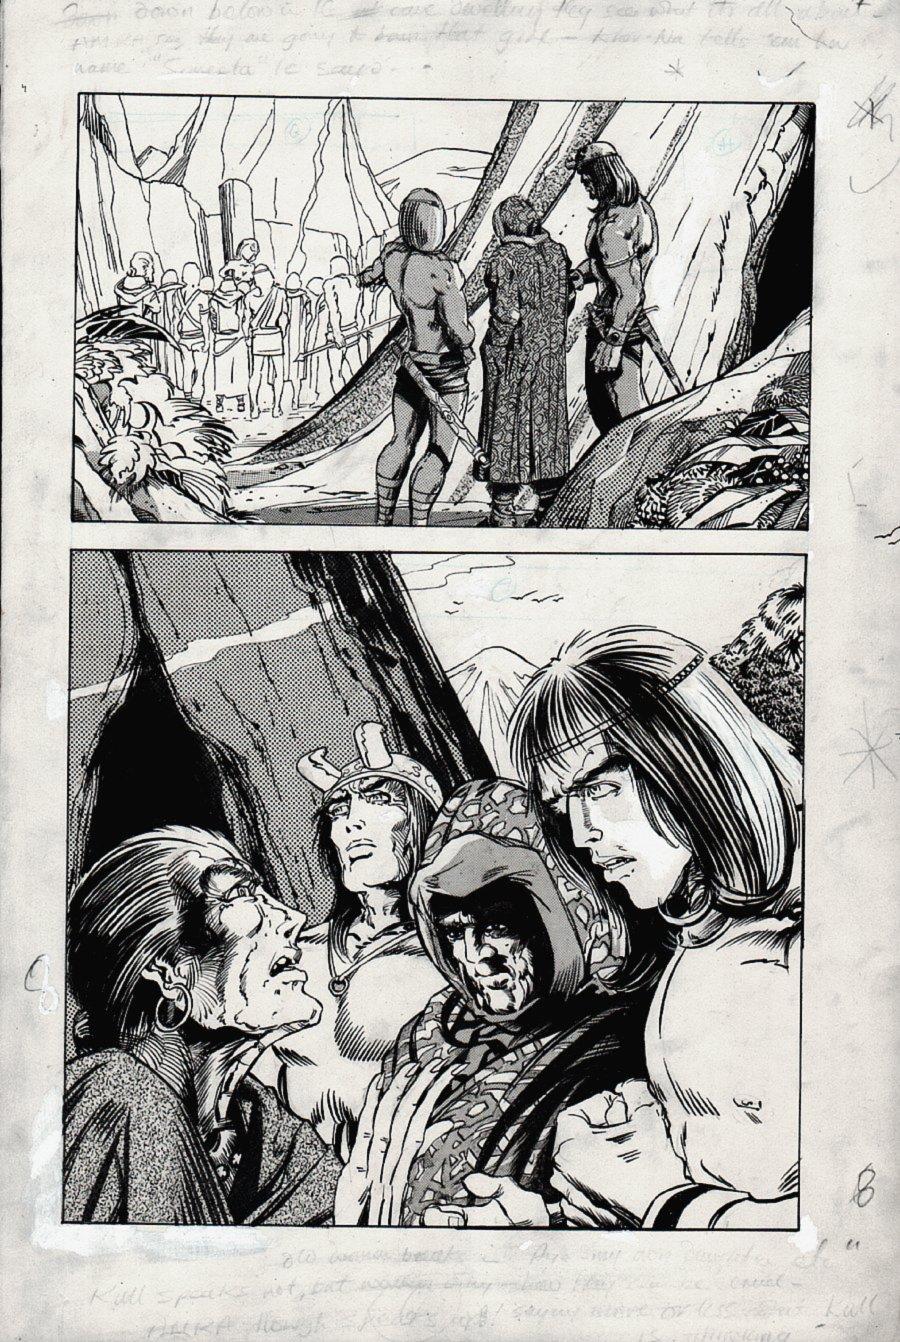 Kull Of Atlantis p 8 SPLASH (Precursor To Conan The Barbarian #1) 1969-1970